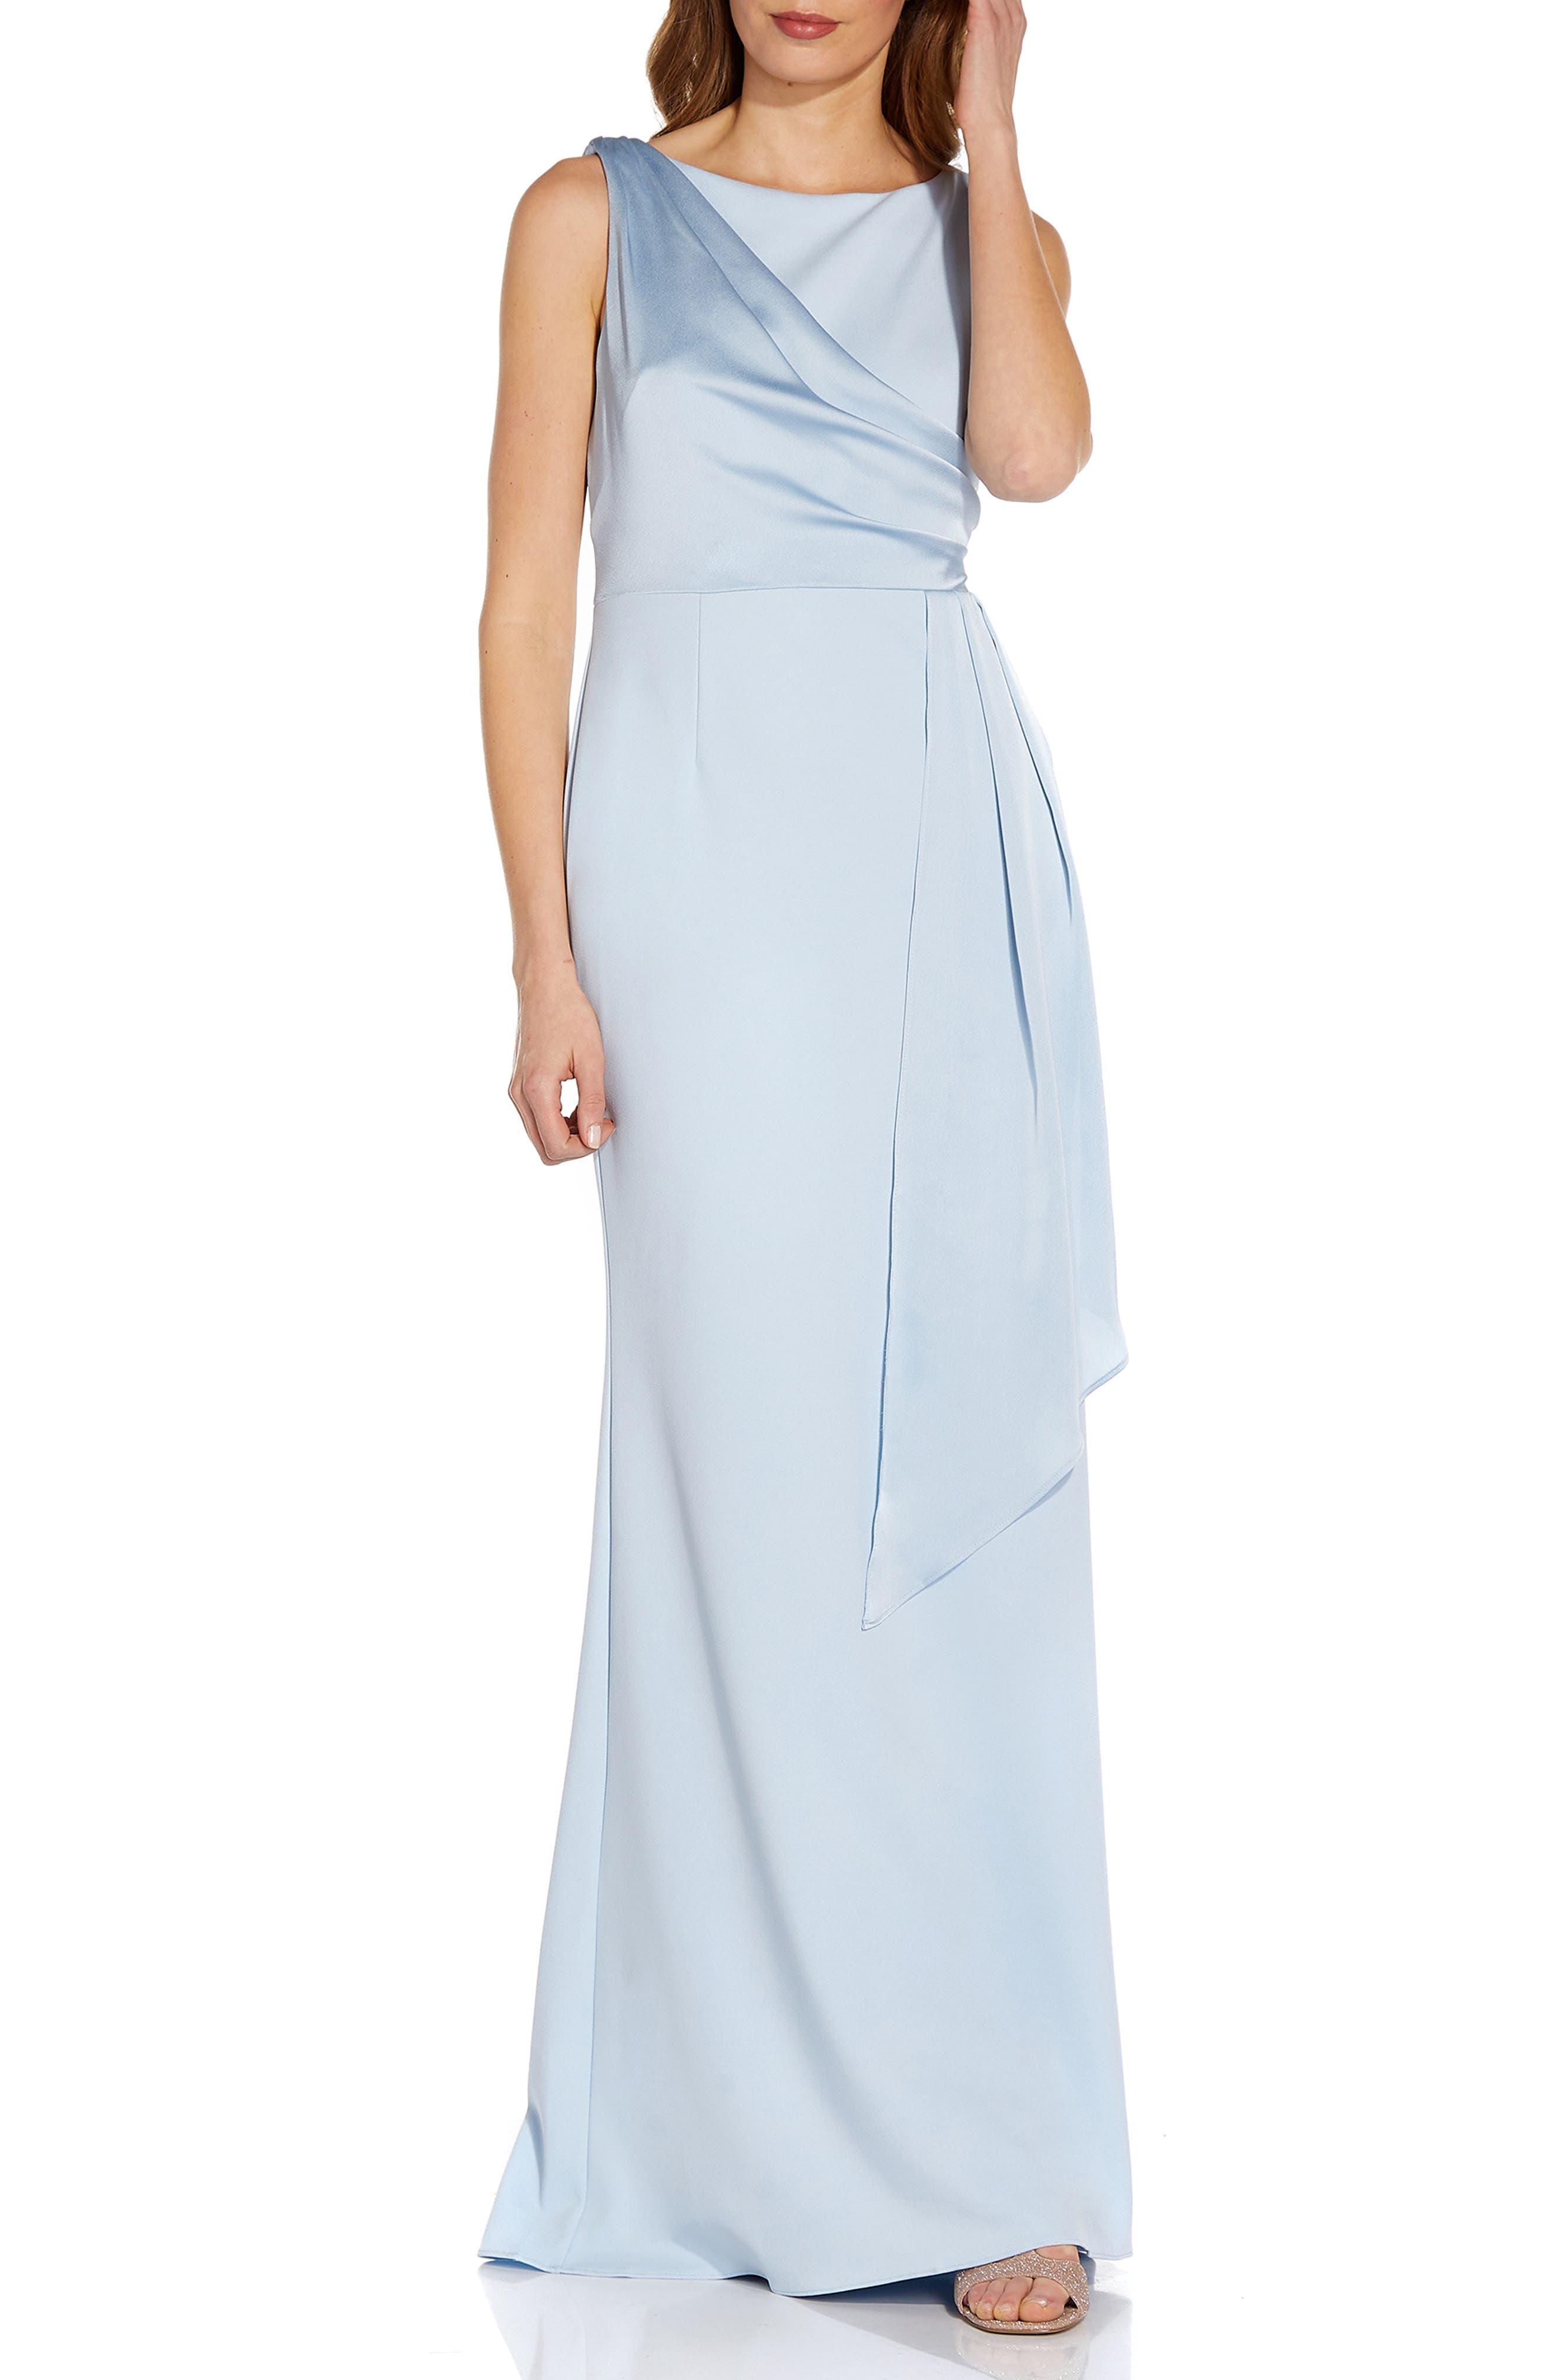 Satin Drape Crepe Gown